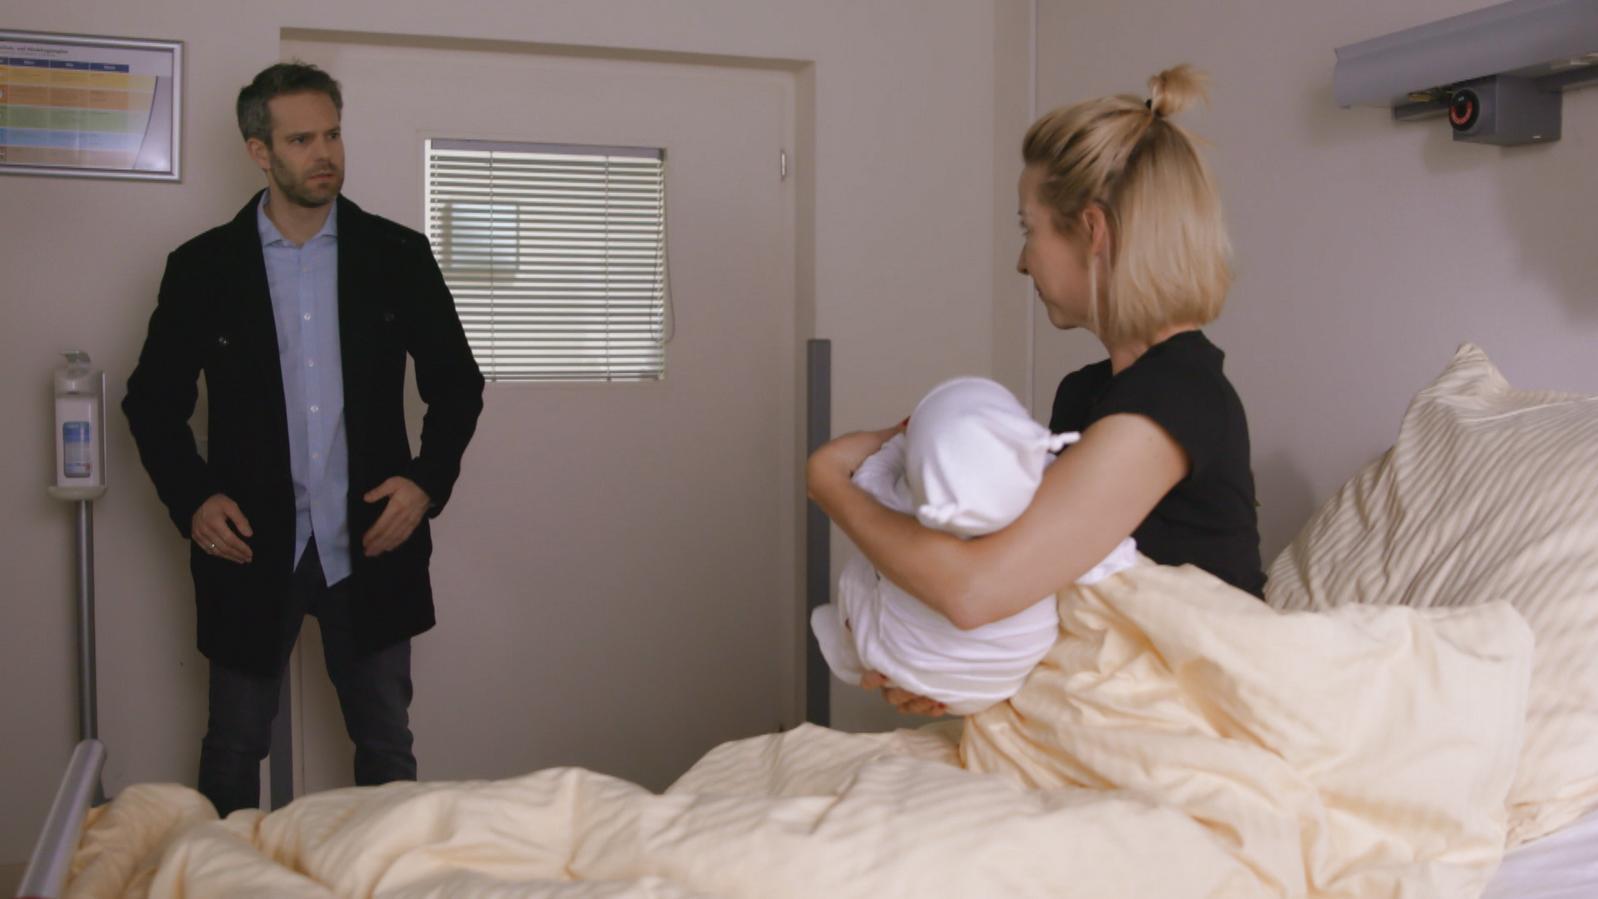 unter uns kl rt till den baby irrtum auf. Black Bedroom Furniture Sets. Home Design Ideas